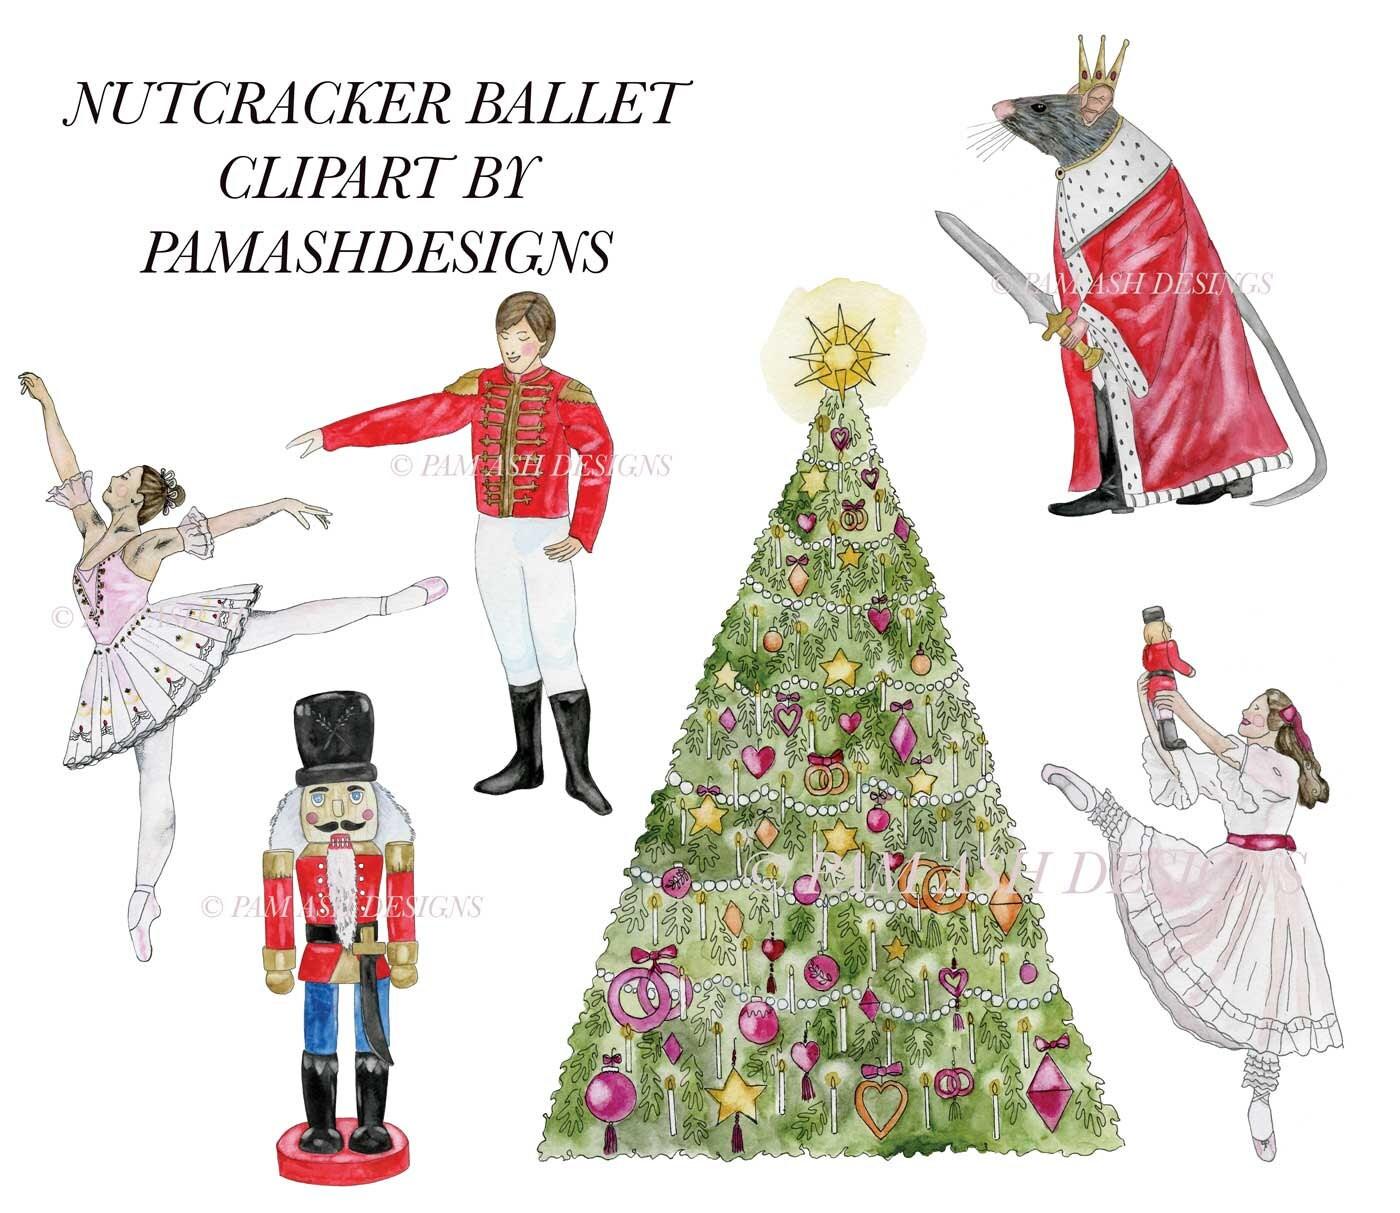 nutcracker ballet watercolor clipart for art projects rh etsy com nutcracker ballet clipart free Nutcracker Ballet Stage